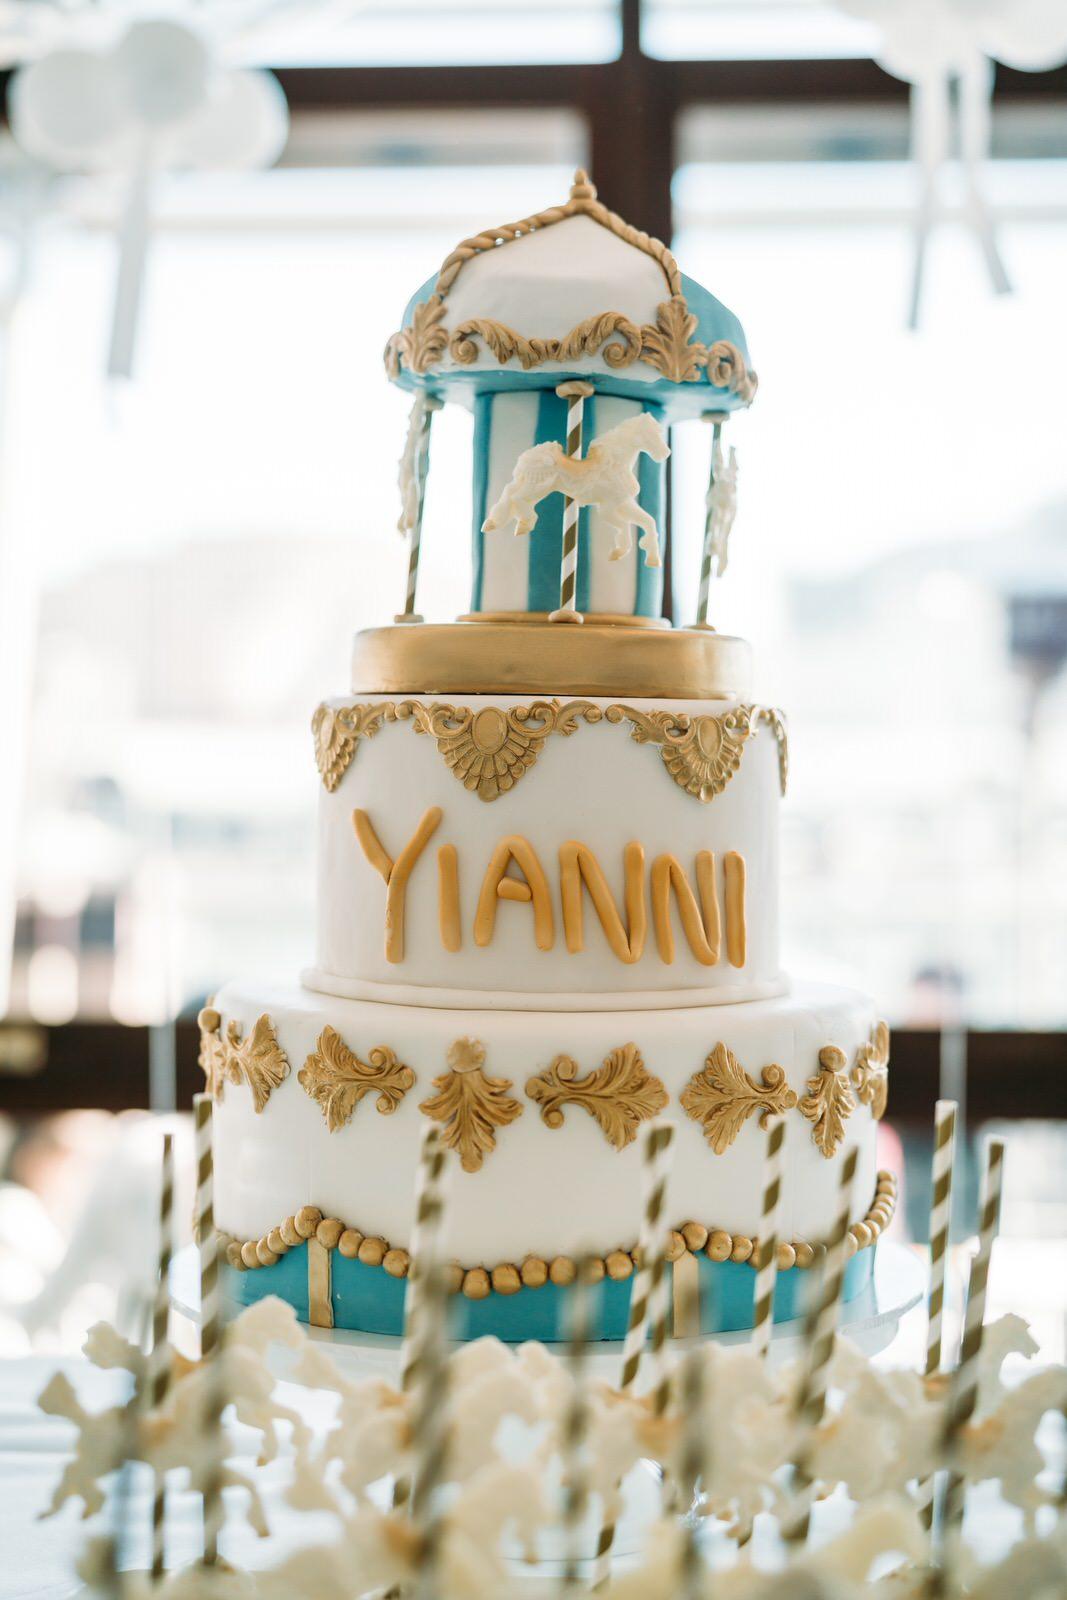 yianni-baptism-st-catherine-orthodox-mascot-laqua-184